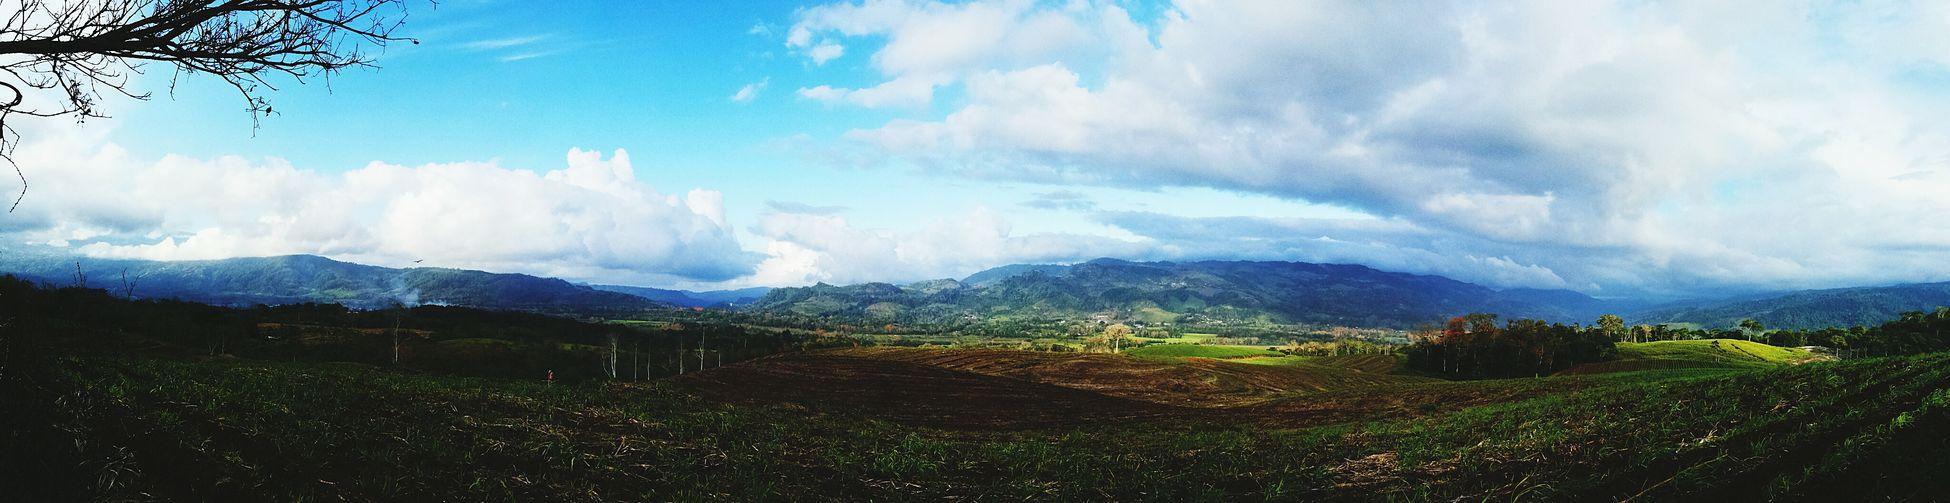 P9 Huawei Landscape Panoramic